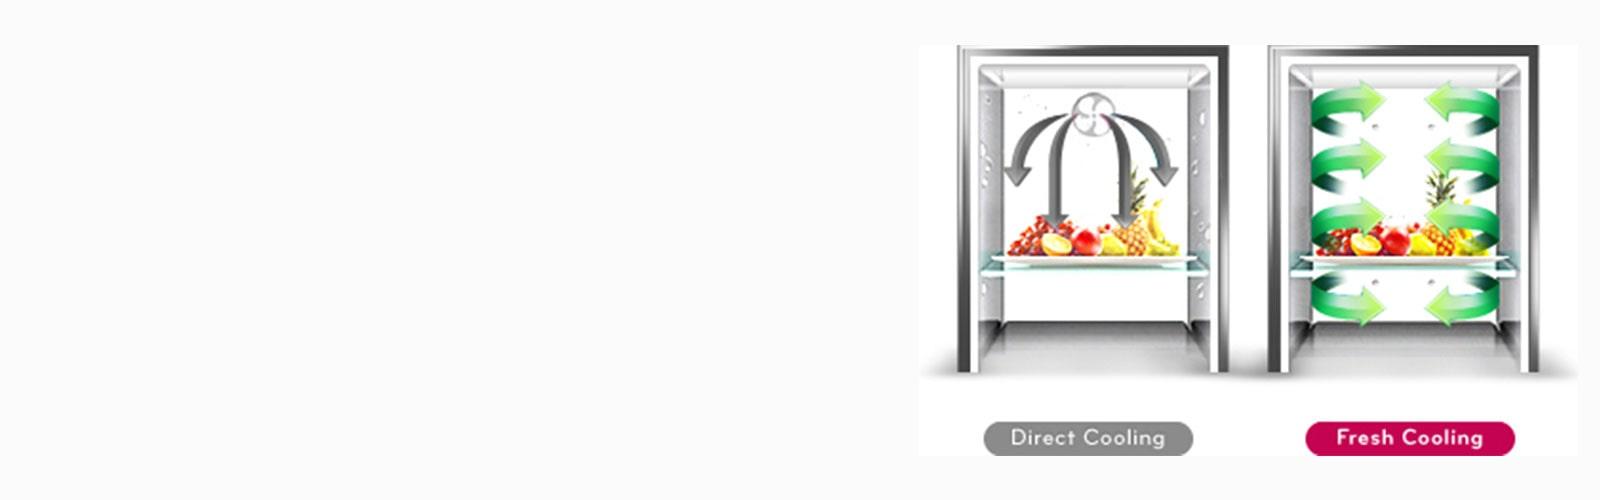 lg-refrigerator-lansen-feature_Large_Fresh_Cooling_D